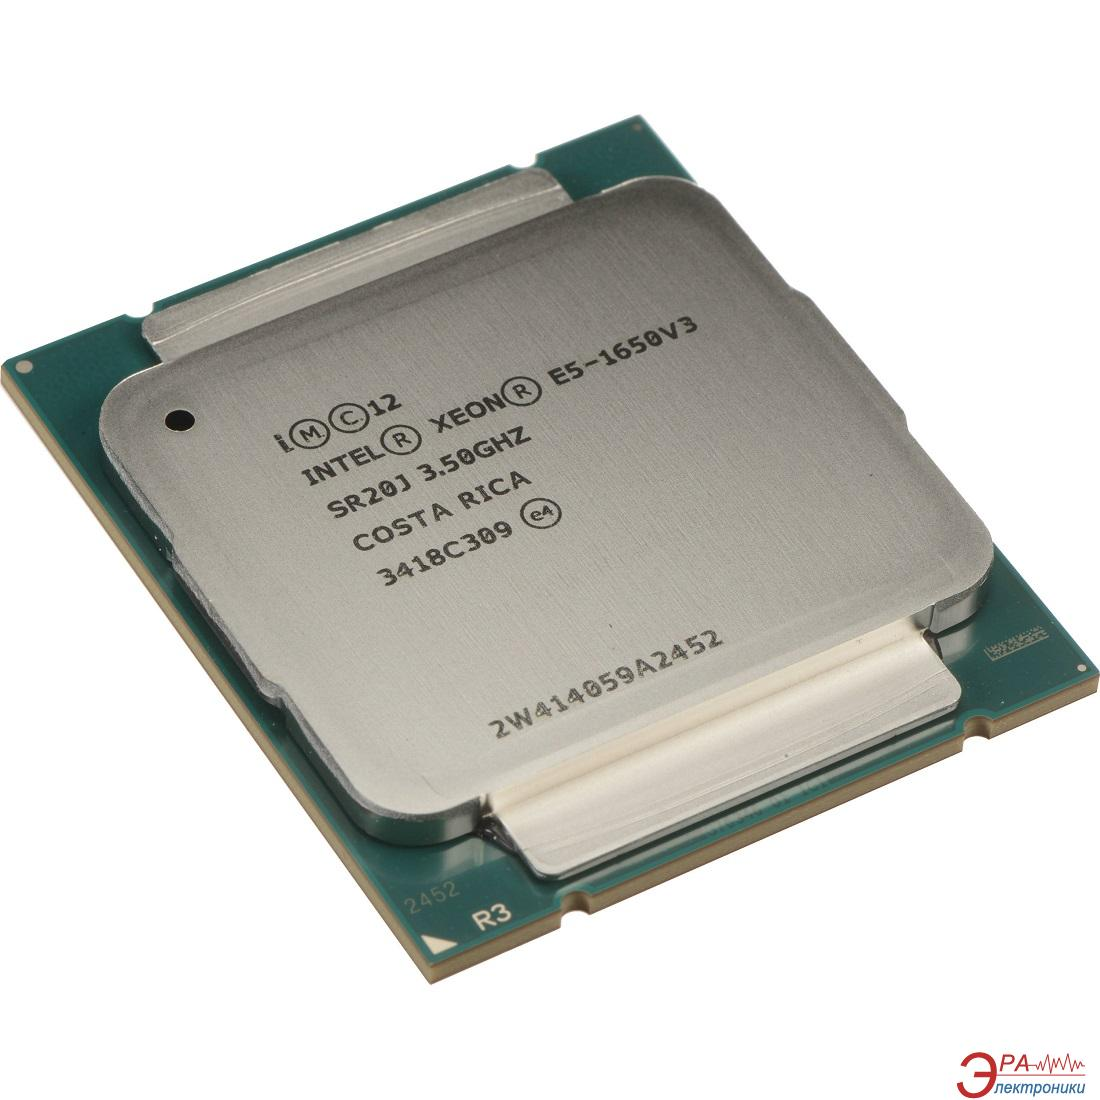 Серверный процессор Intel Xeon E5-1650V3 (CM8064401548111) Tray